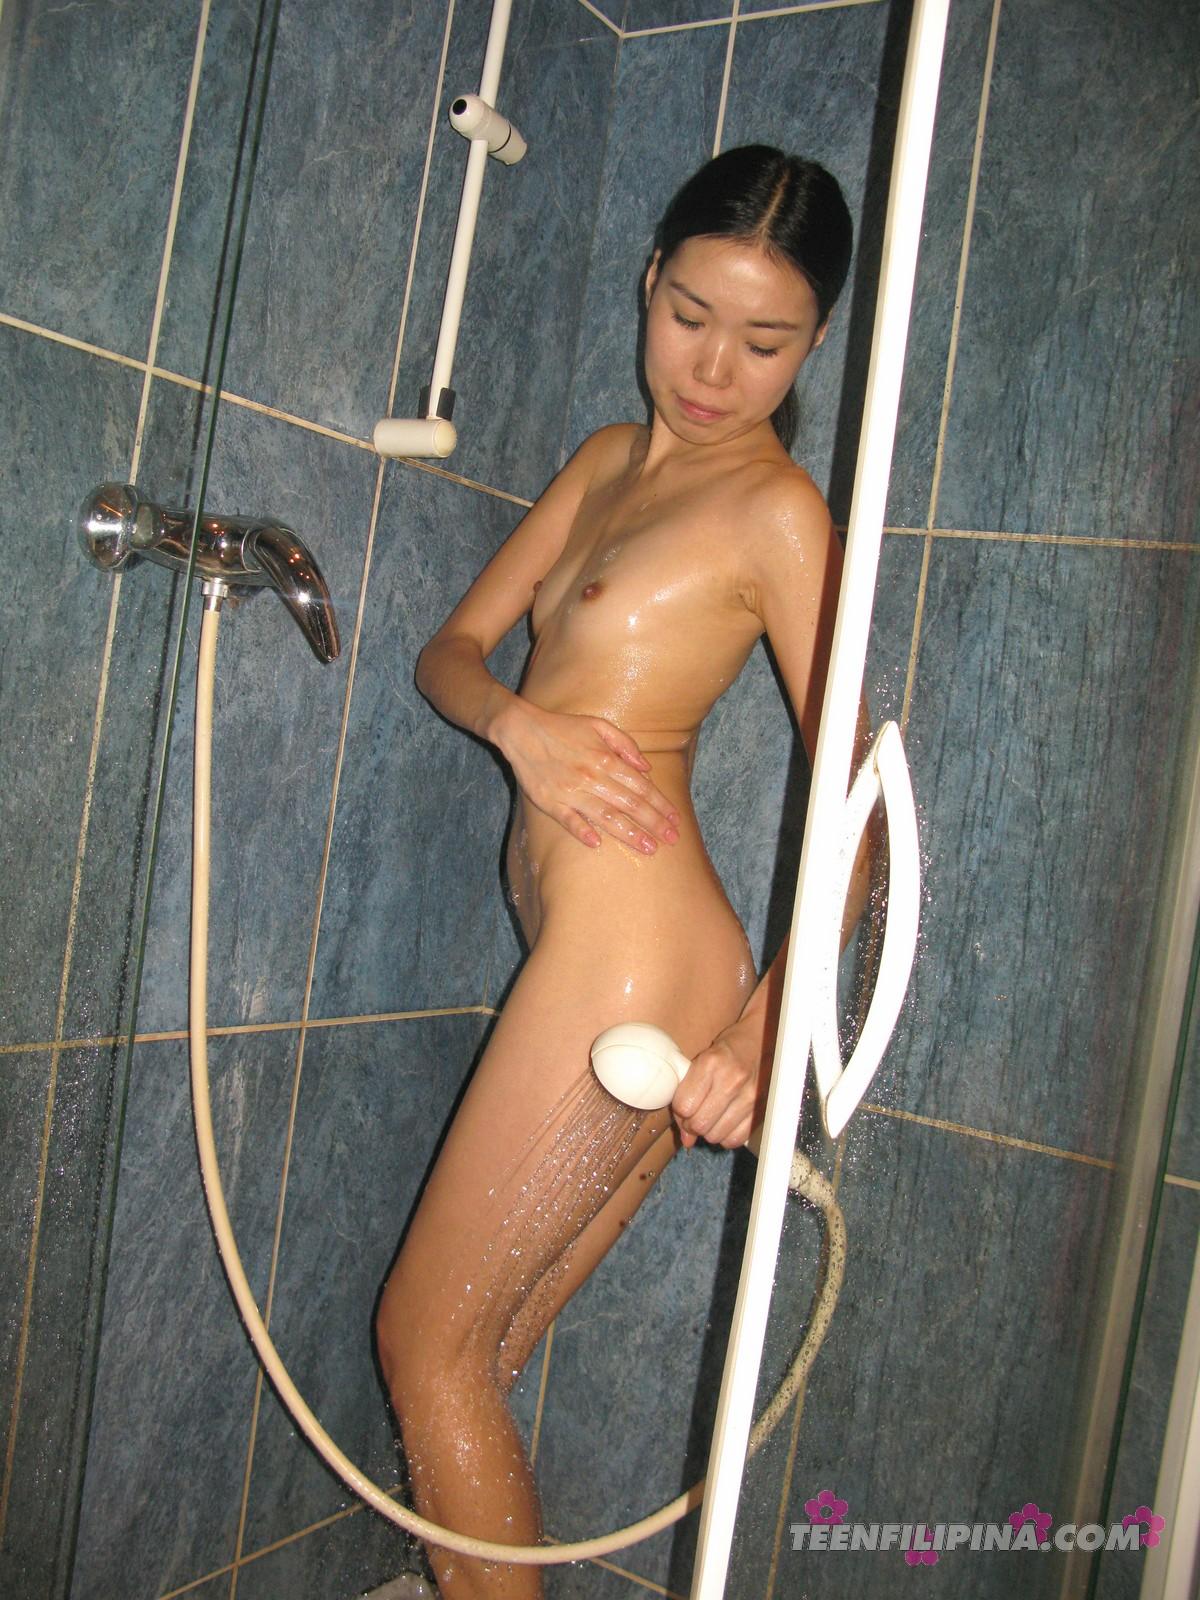 China girl shower show 9